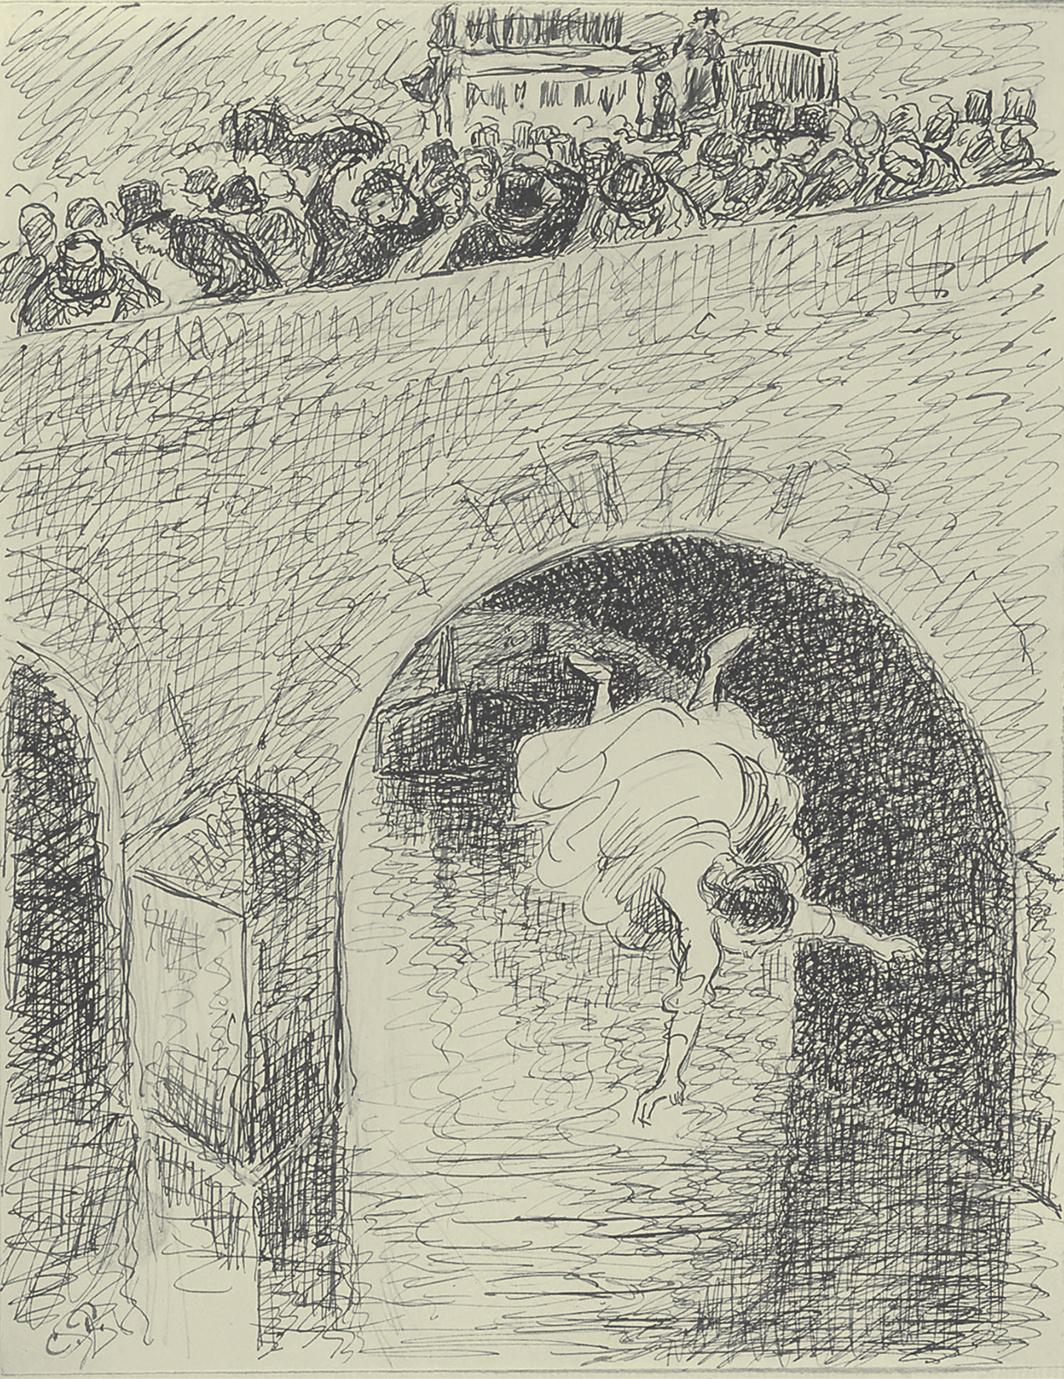 "Camille Pissarro, Suicide de l'abandonné (Suicide of an Abandoned Woman), 1889–90, ink and pencil on paper, 12 1⁄4 × 9 1⁄2"". From Turpitudes sociales (Social Disgraces), 1889–90."